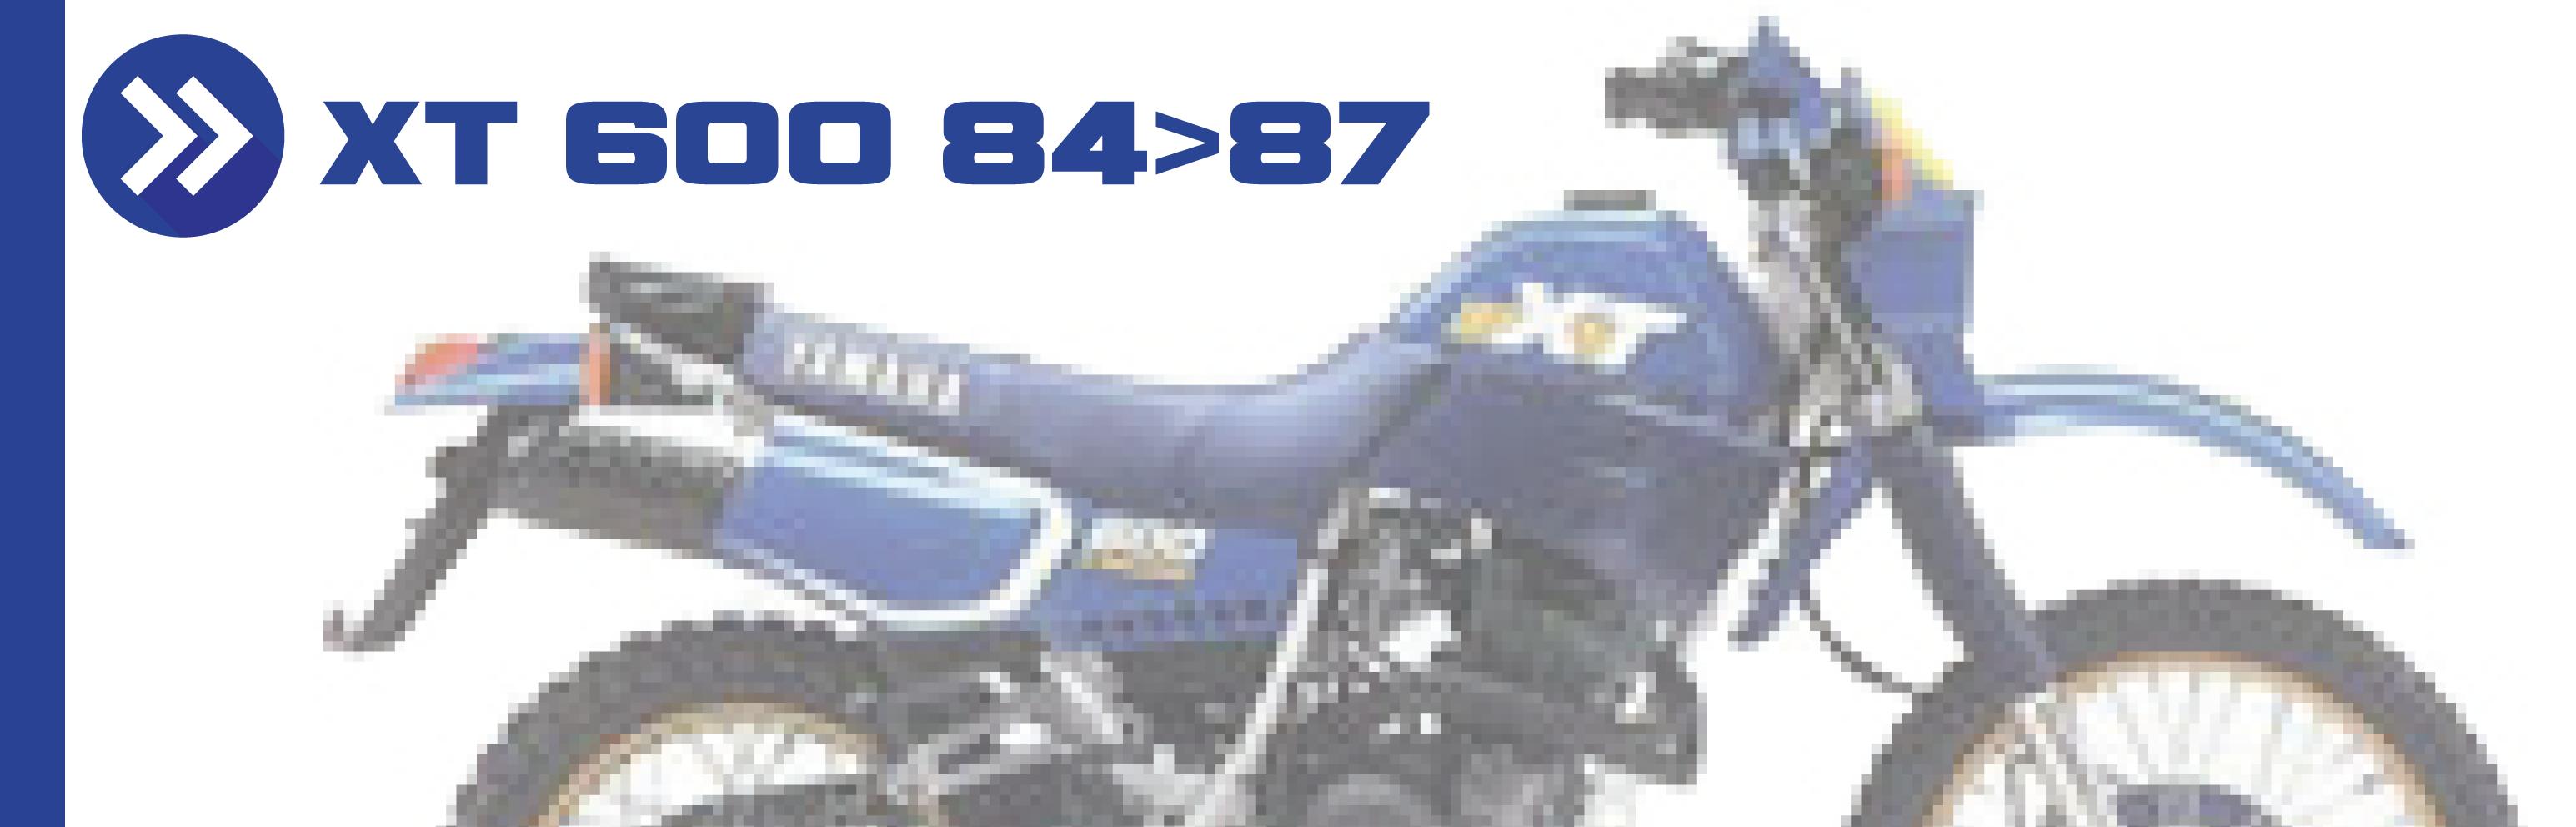 XT 600 84>87